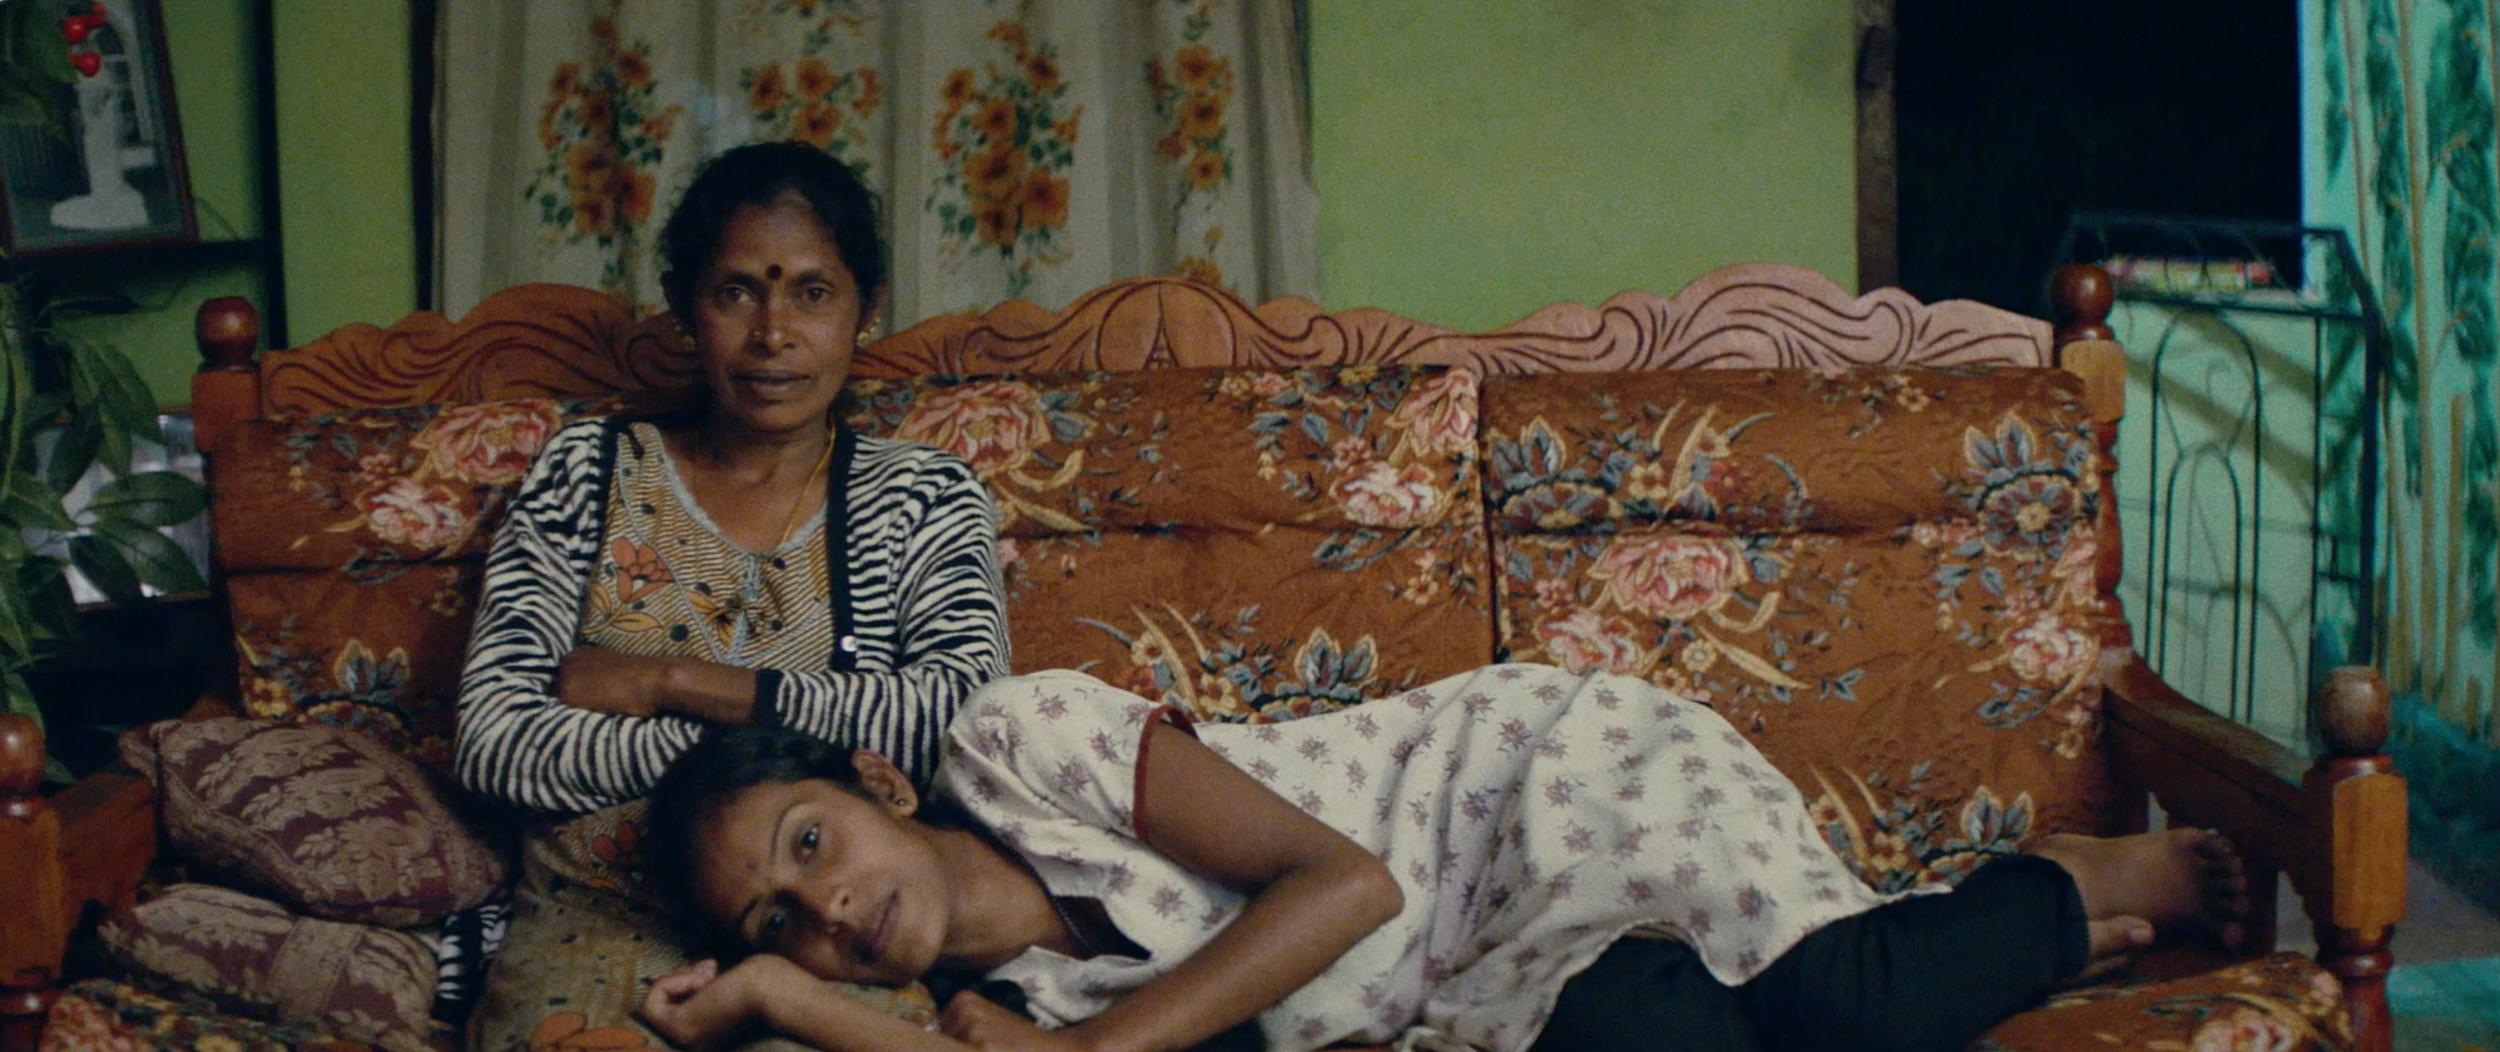 BLKFLM_VanessaBlack_SriLanka_Vogue_GapIncScreen Shot 2017-02-13 at 12.17.33 PM.png